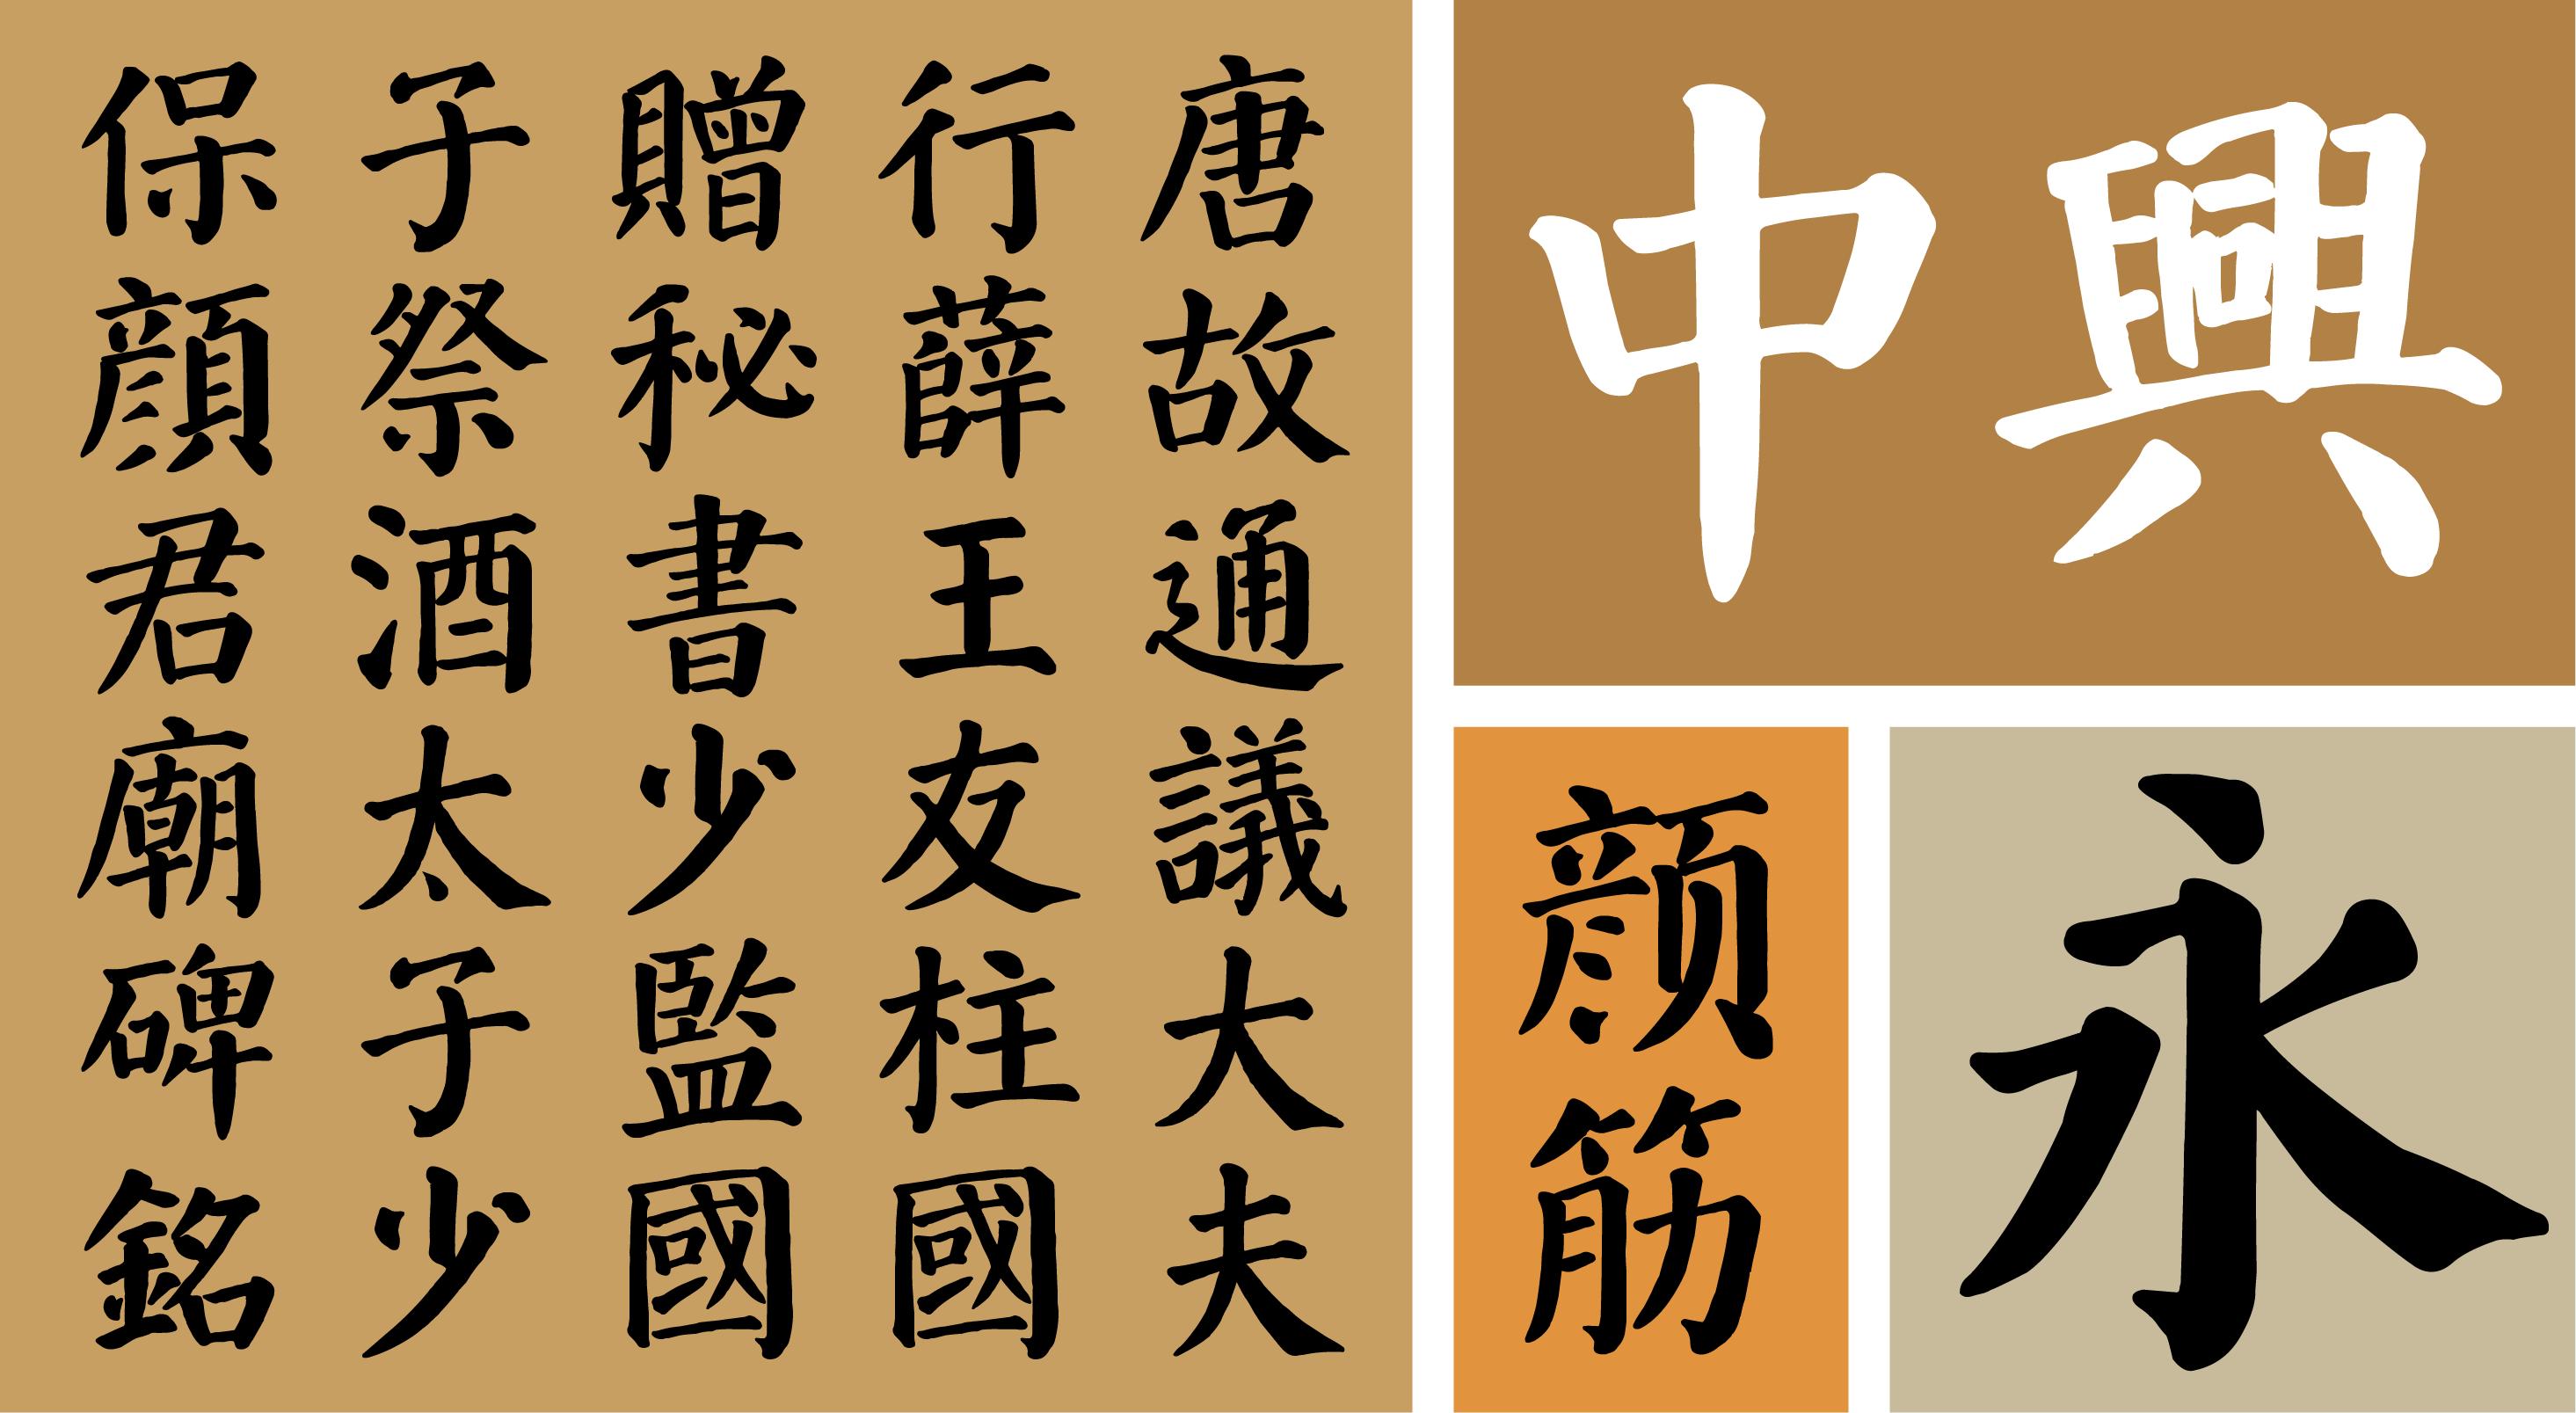 https://ft-bk1.oss-cn-zhangjiakou.aliyuncs.com/Public/Uploads/img/n_content_20201210174809_8179.png